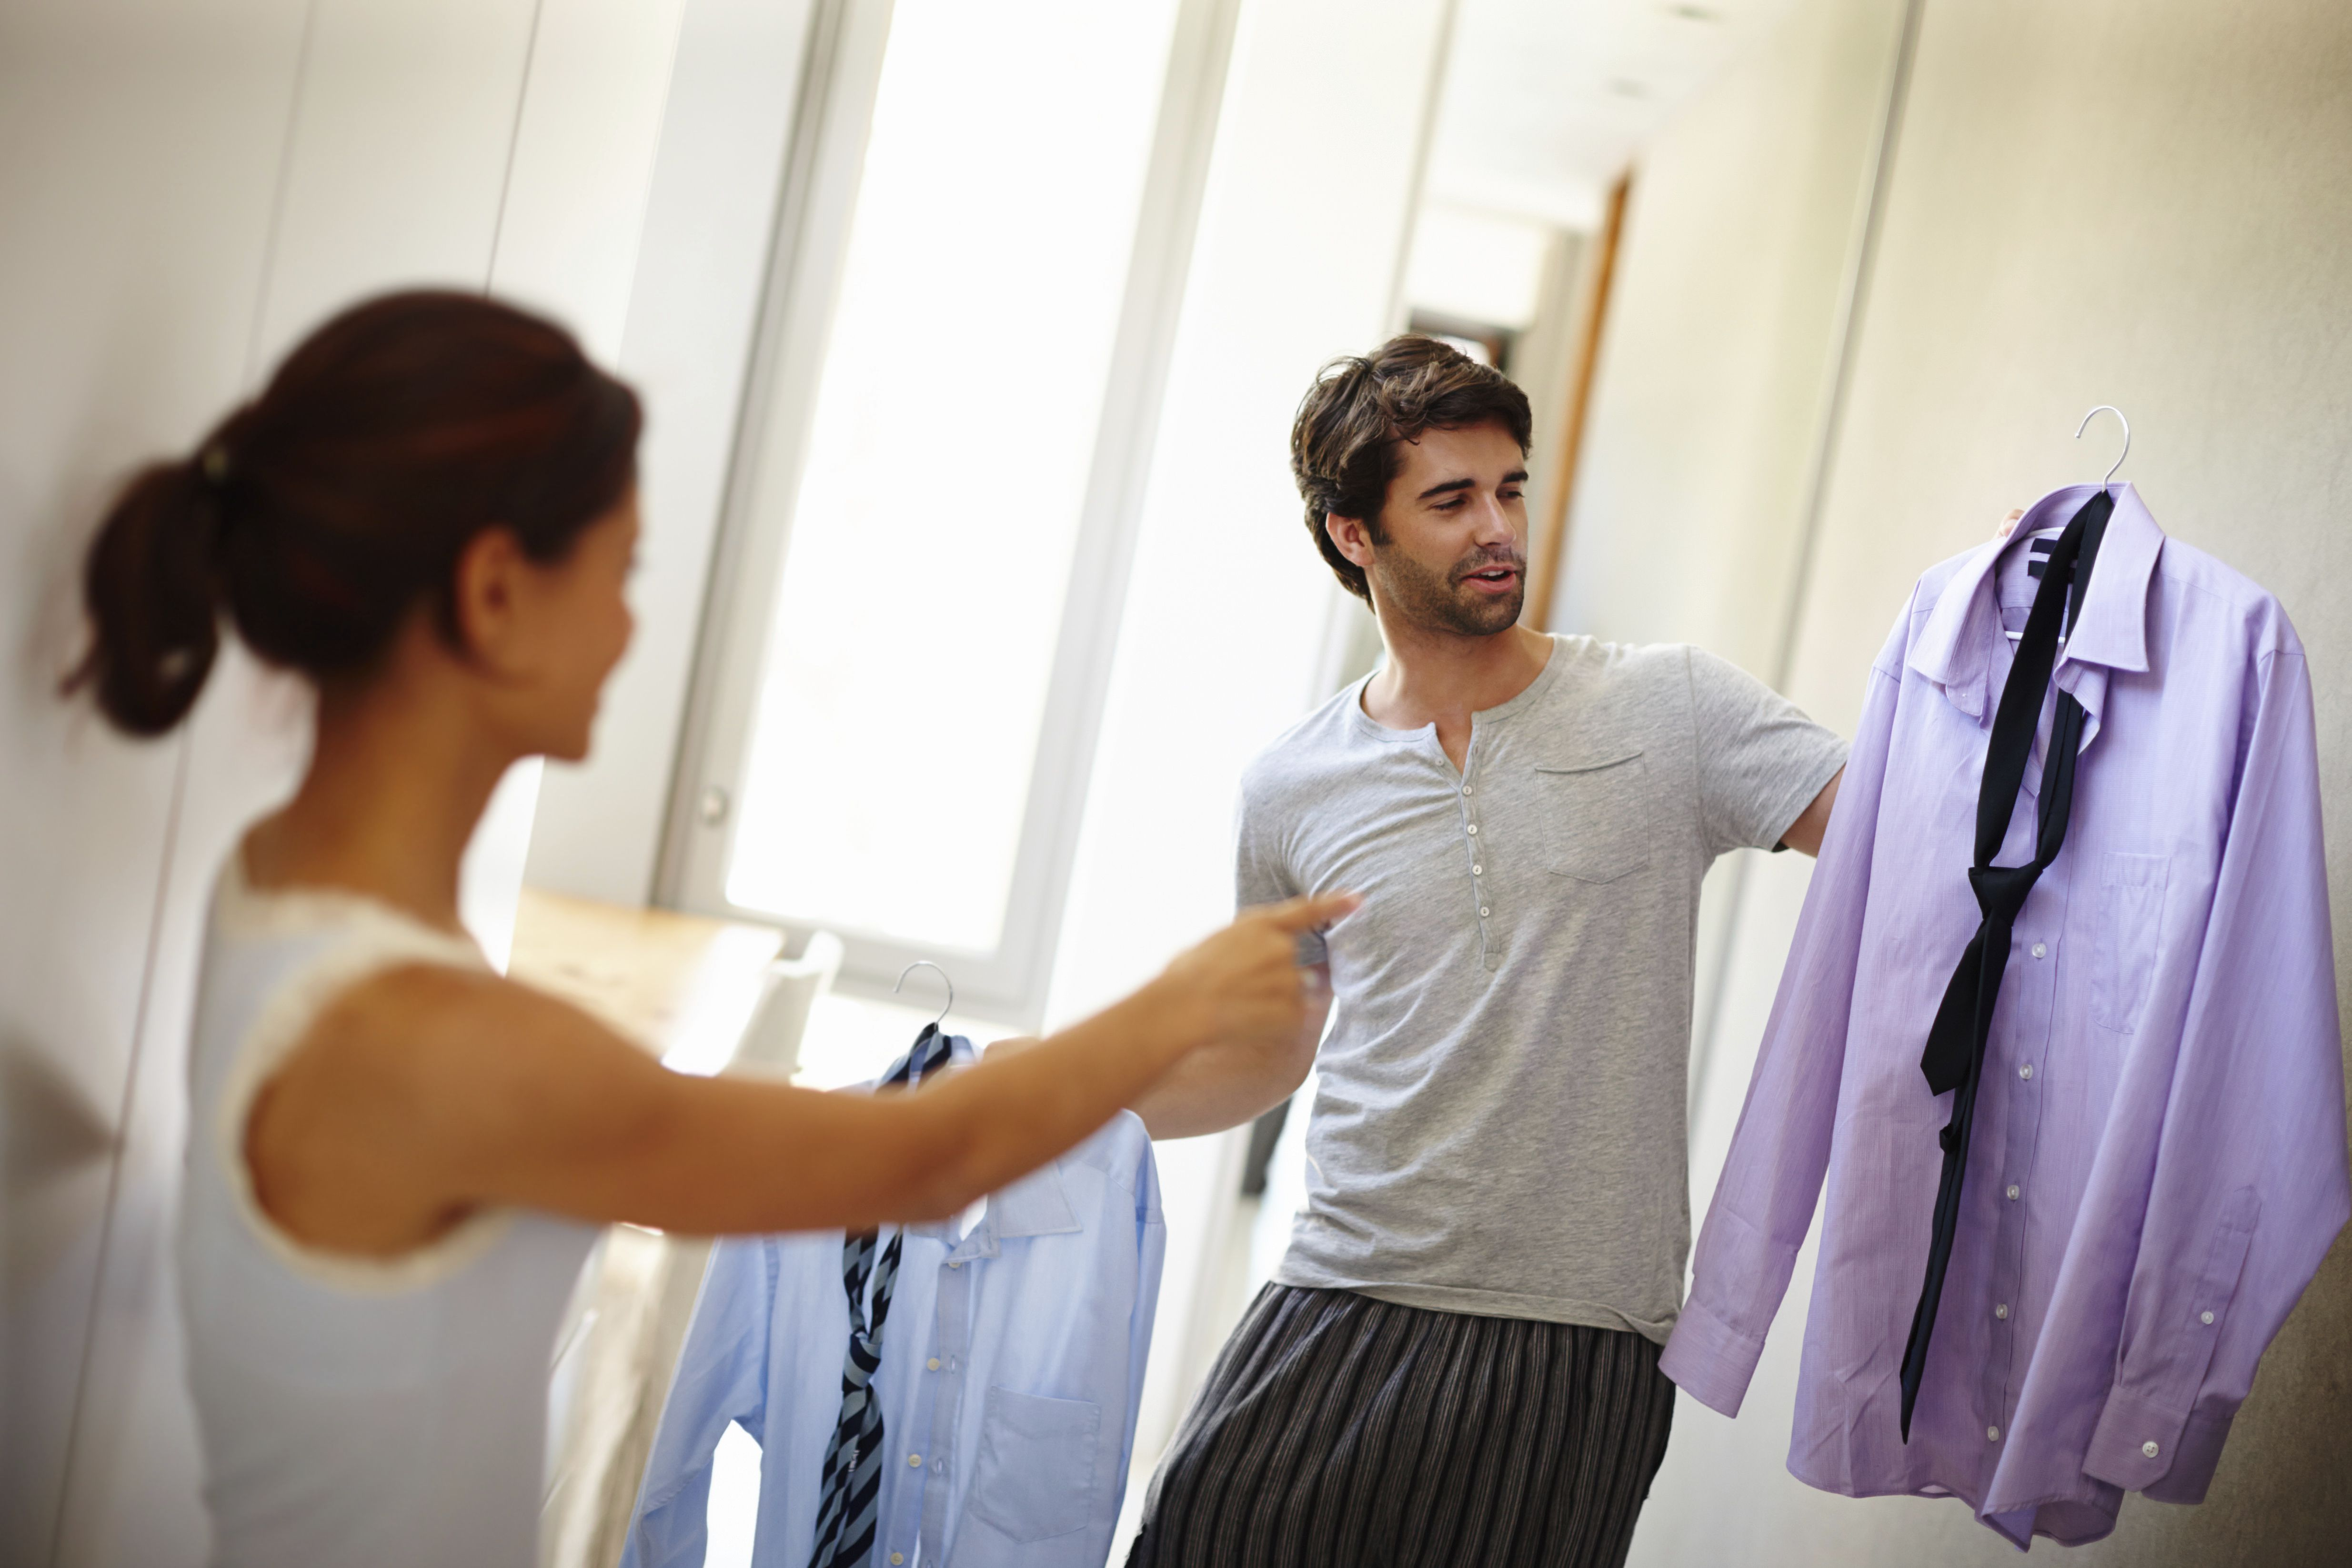 Use ropa ajustada